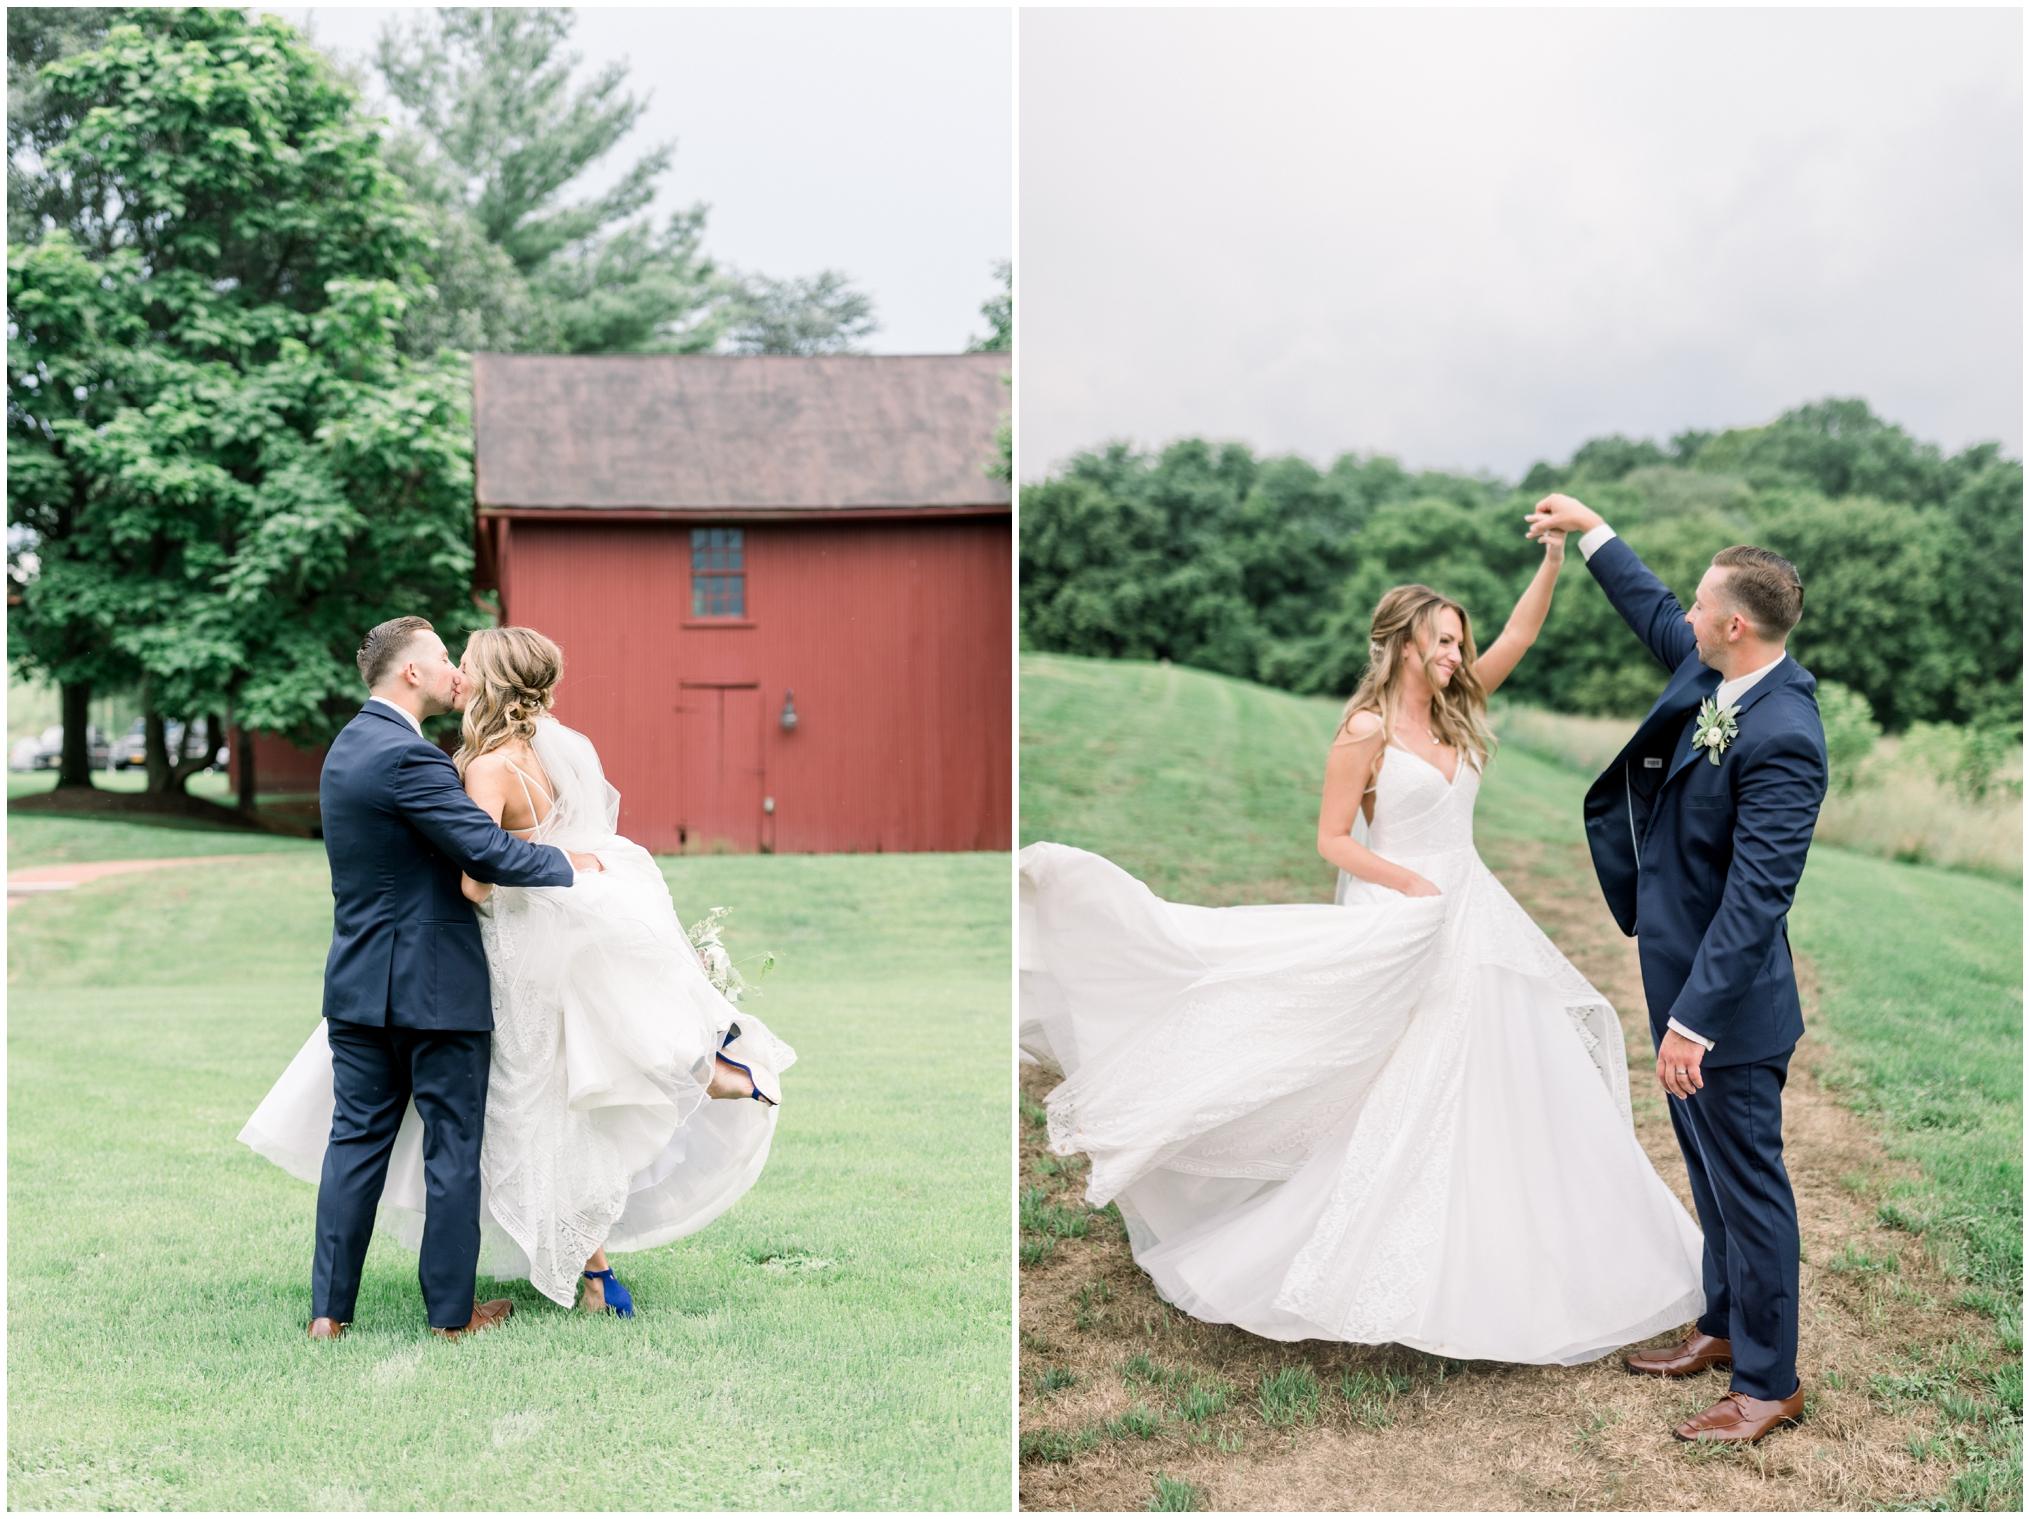 Krista Brackin Photography | July Wedding at The Farm at Eagle's Ridge_0021.jpg